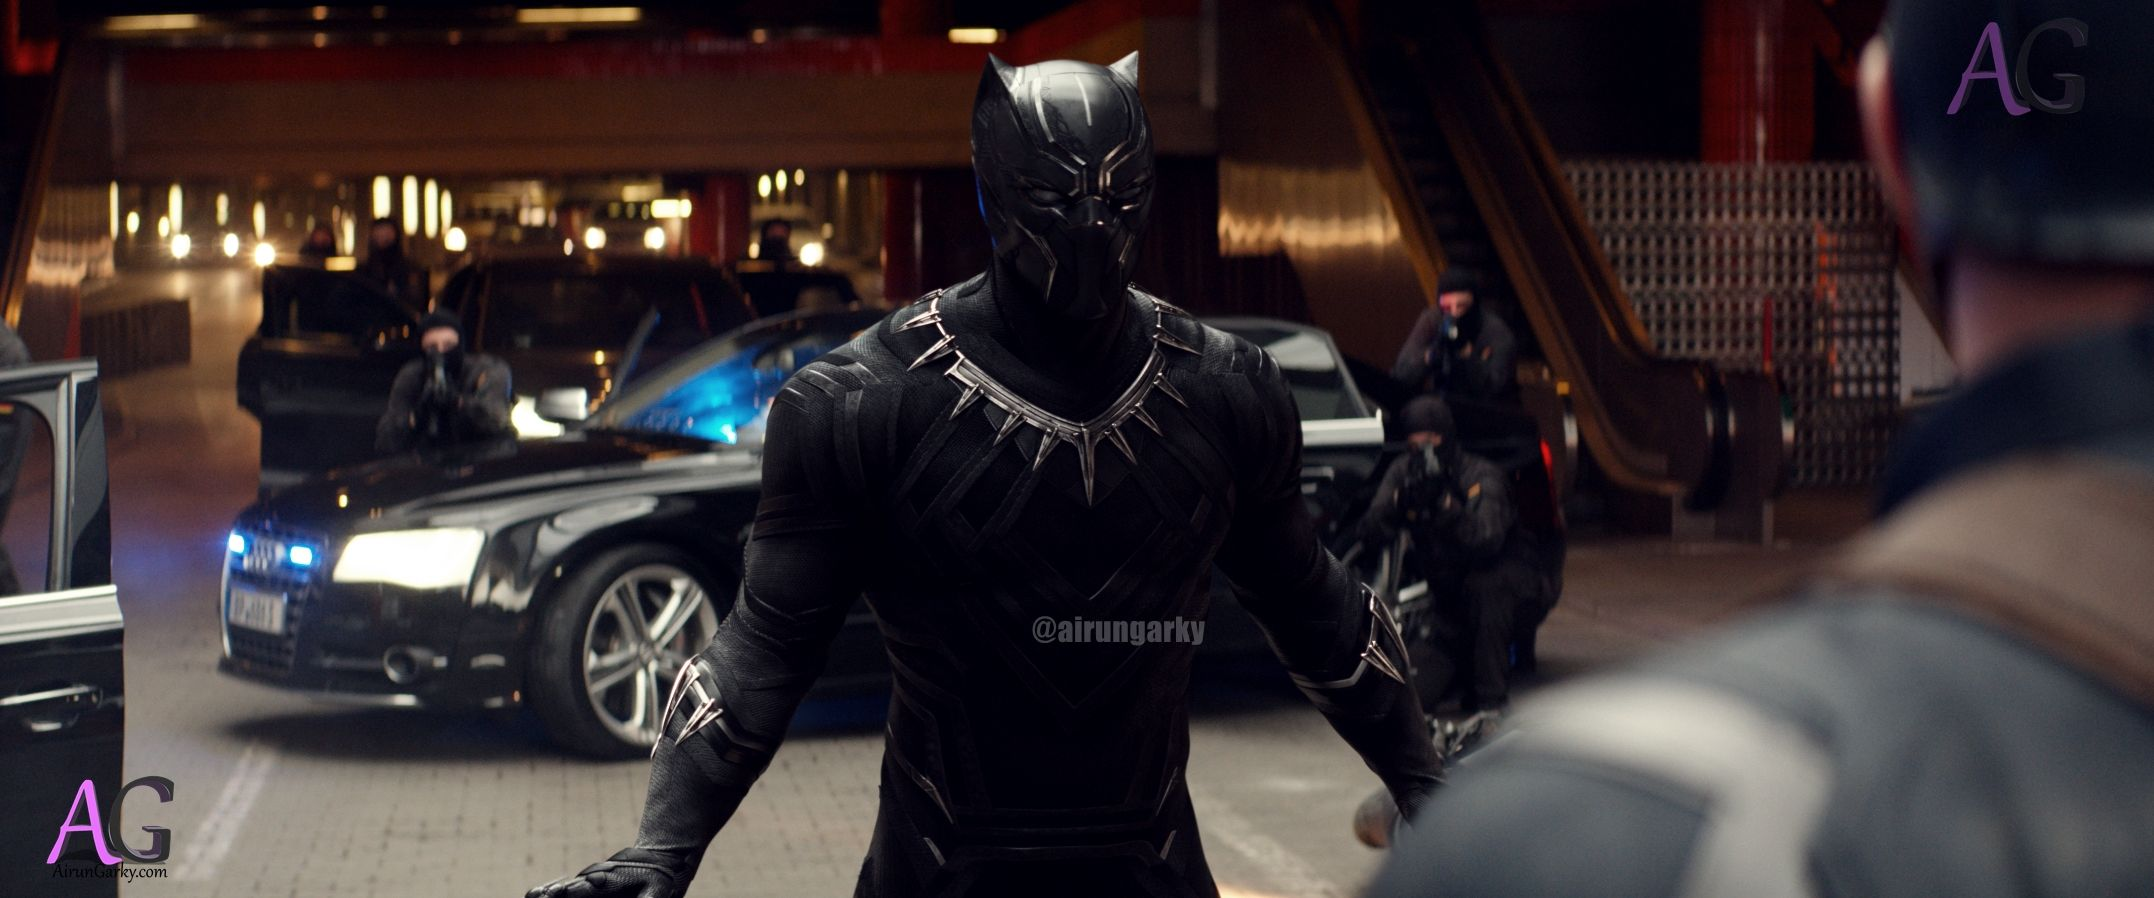 Fast Simple Image Host Marvel Captain America Captain America Civil War Marvel Cinematic